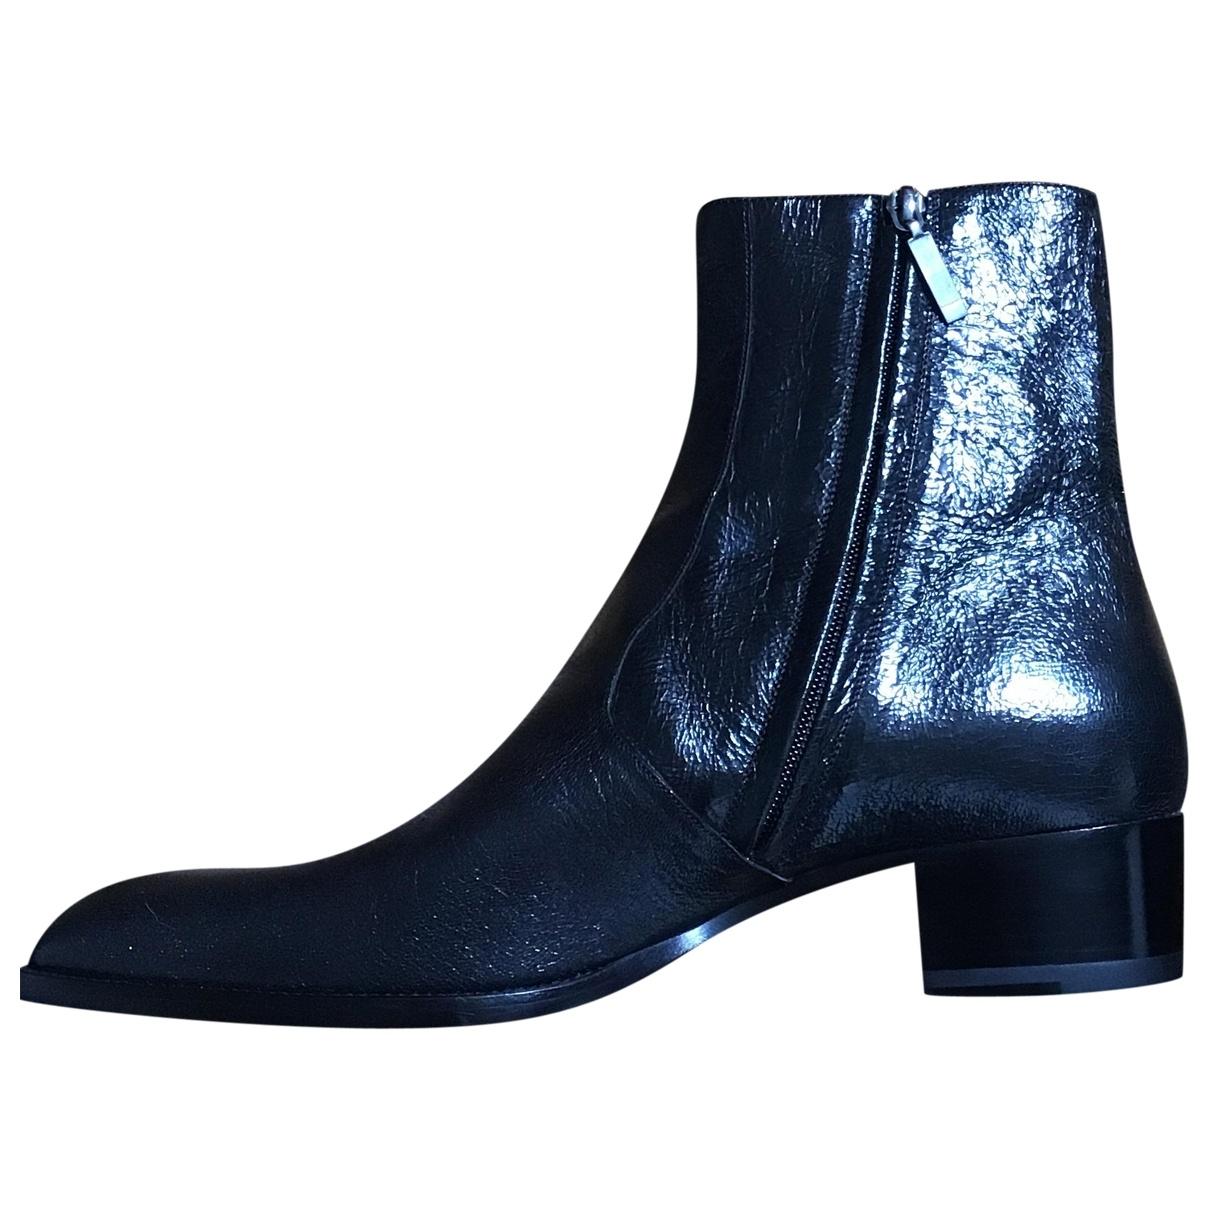 Yves Saint Laurent N Black Leather Boots for Men